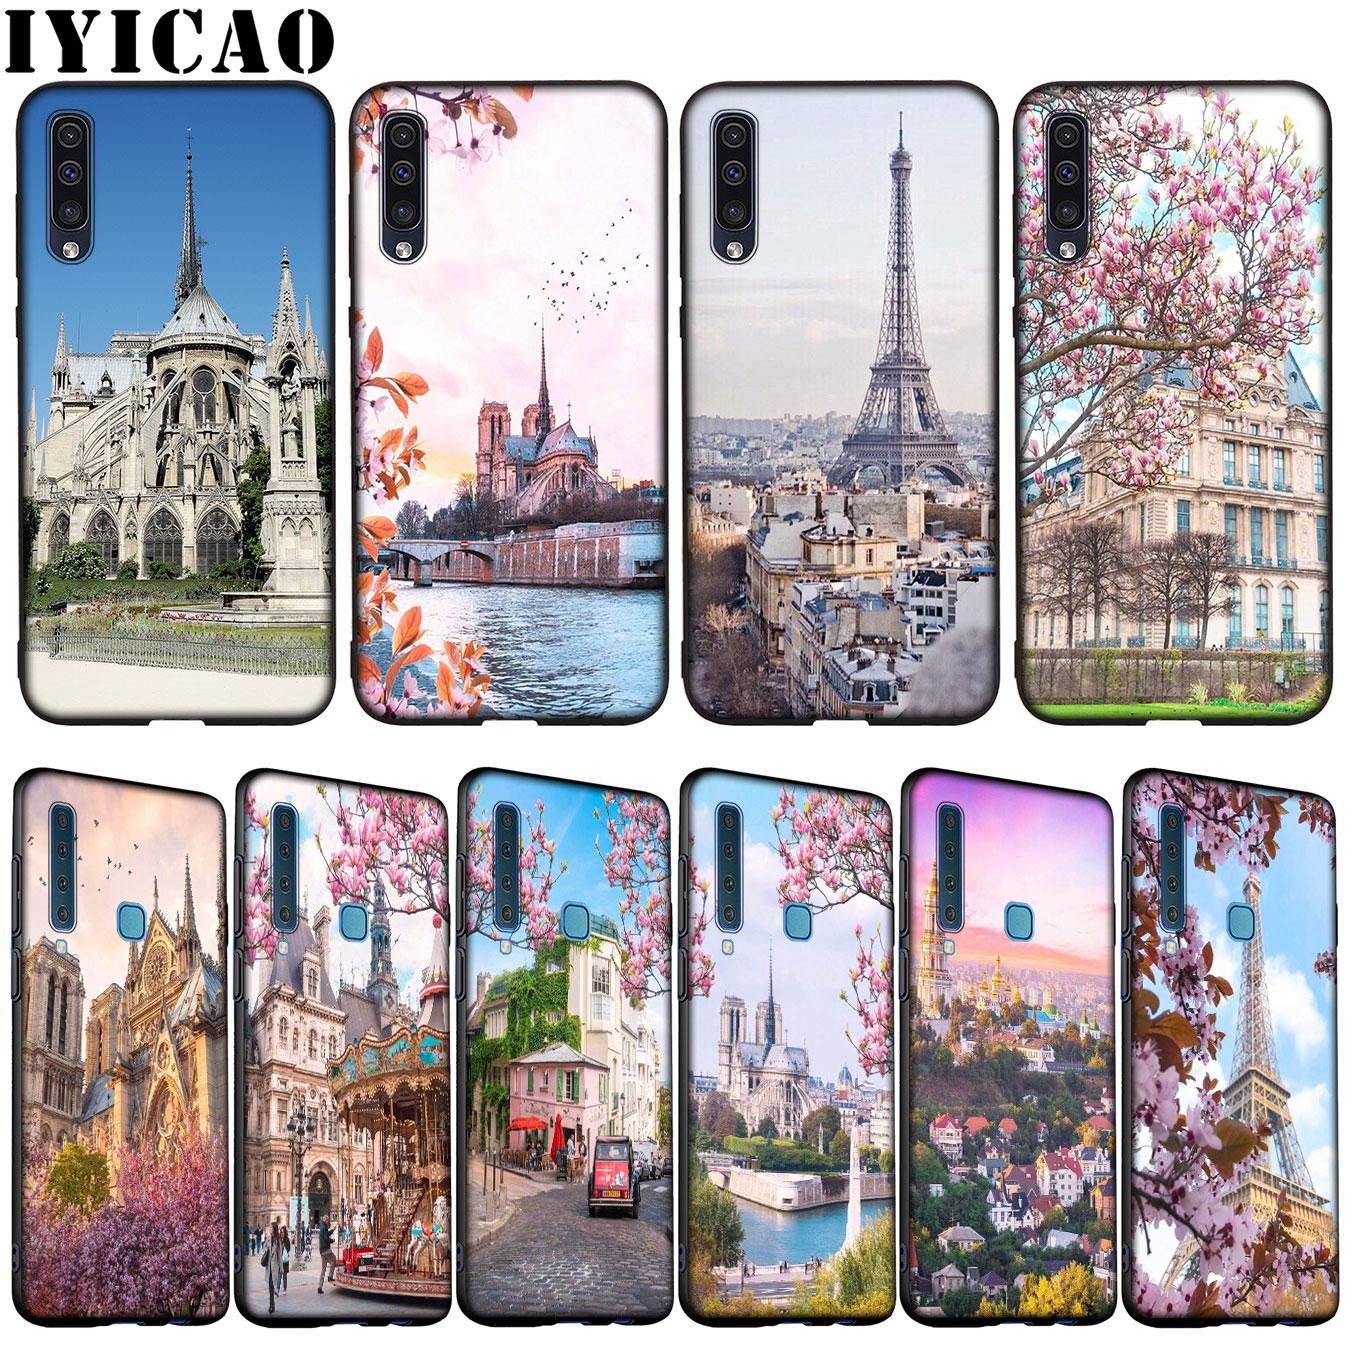 Romántica ciudad de París fantástico paisaje suave caso para Samsung Galaxy A70 A60 A50 A40 A30 A20 A10 M10 M20 M30 M40 A20E